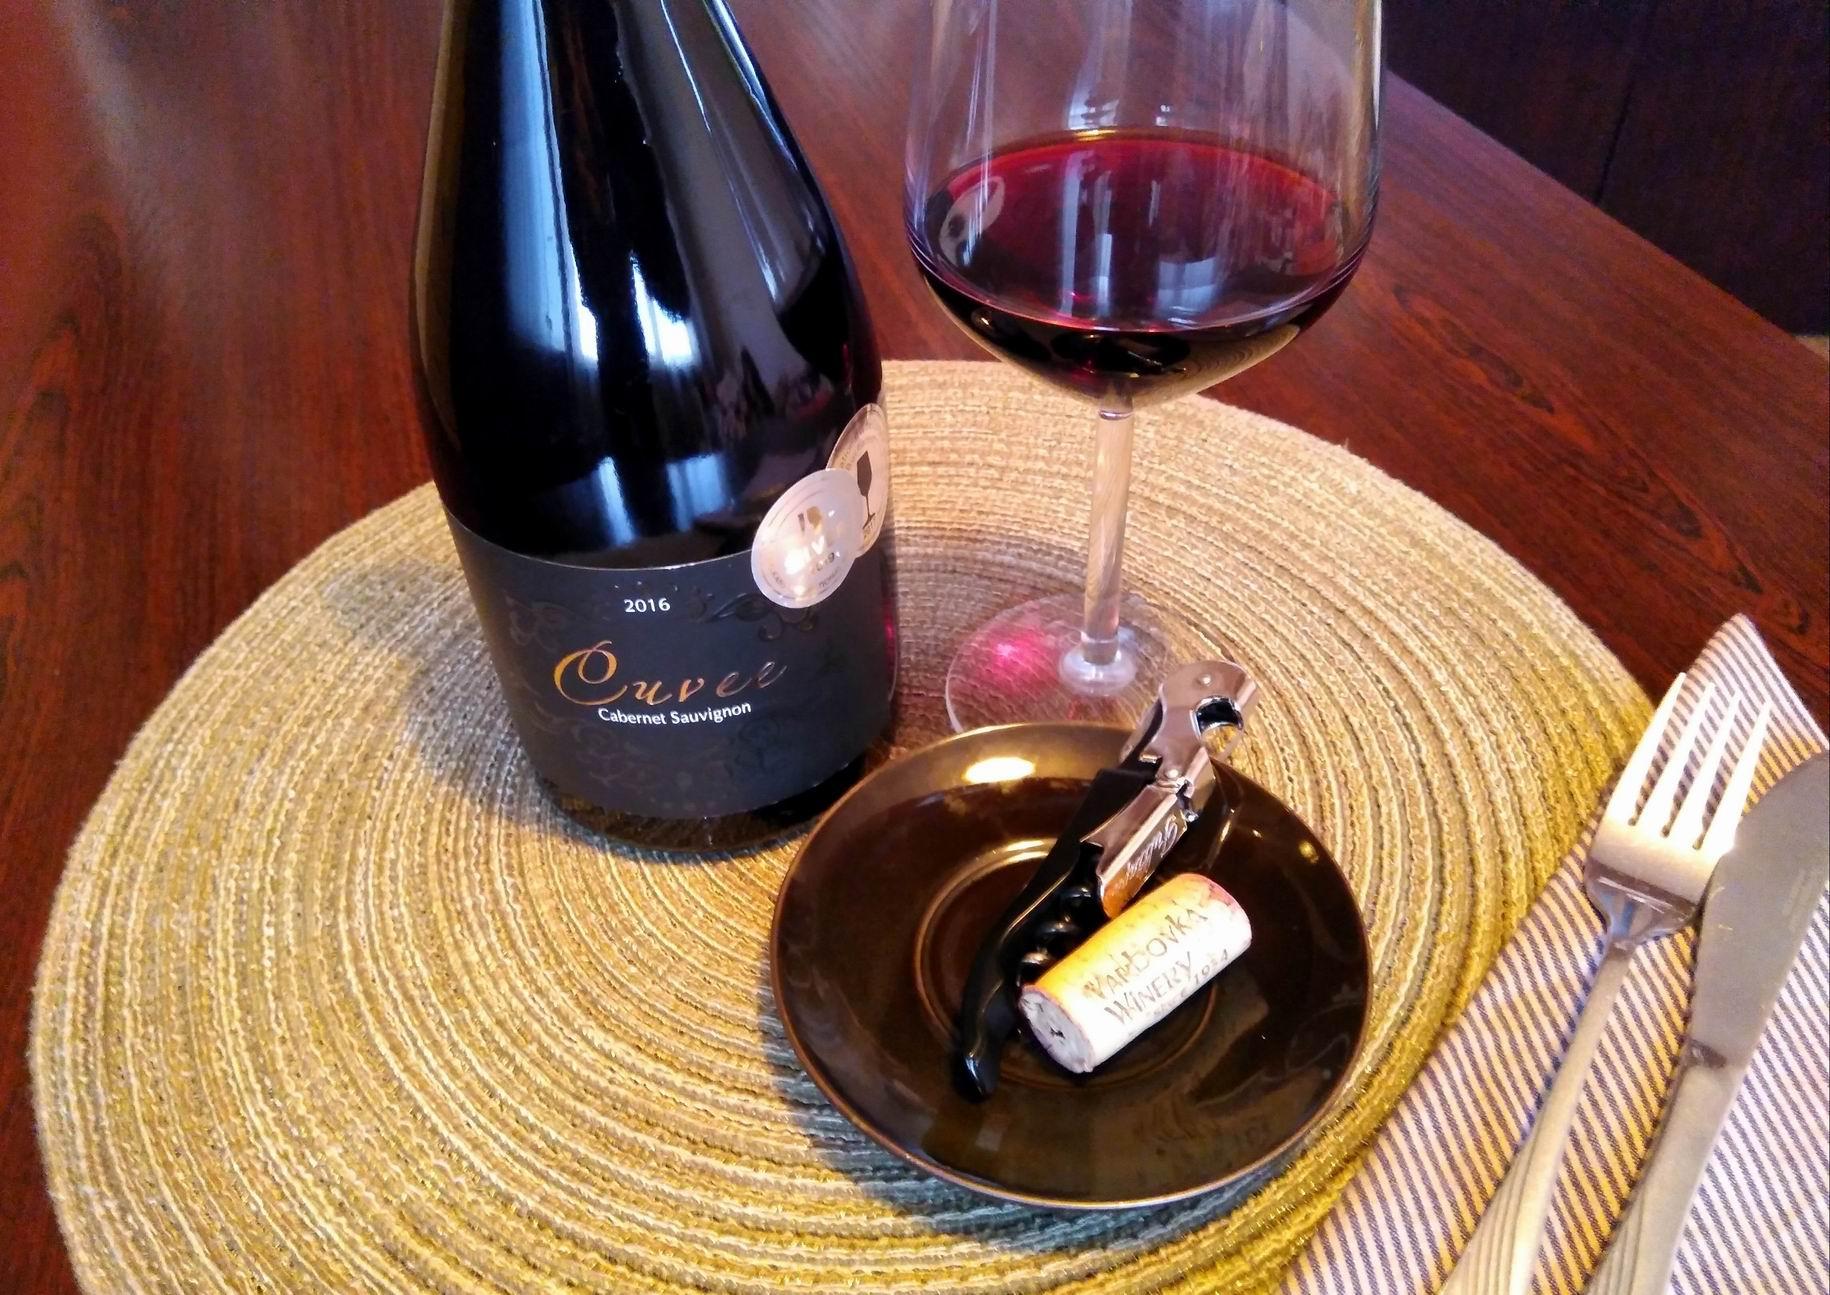 Cuvee Cabernet Sauvignon 2016 – Varbovka Winery